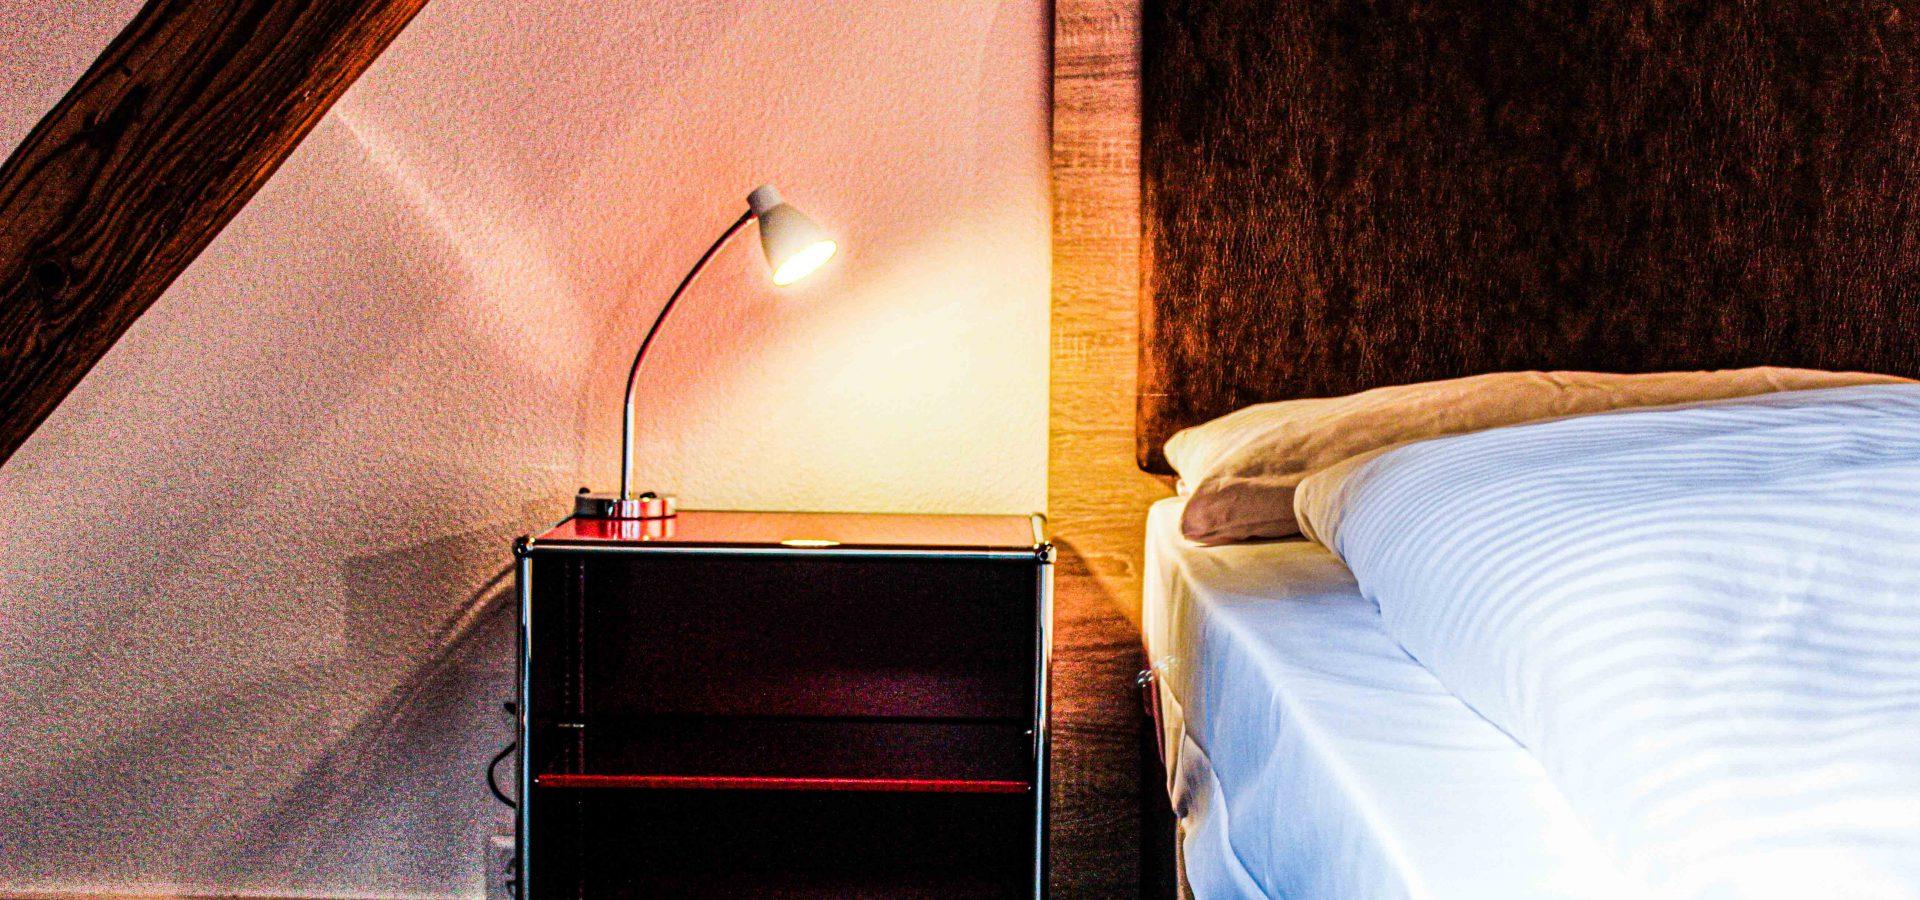 Koncept Hotel Löie in Münsingen bei Bern